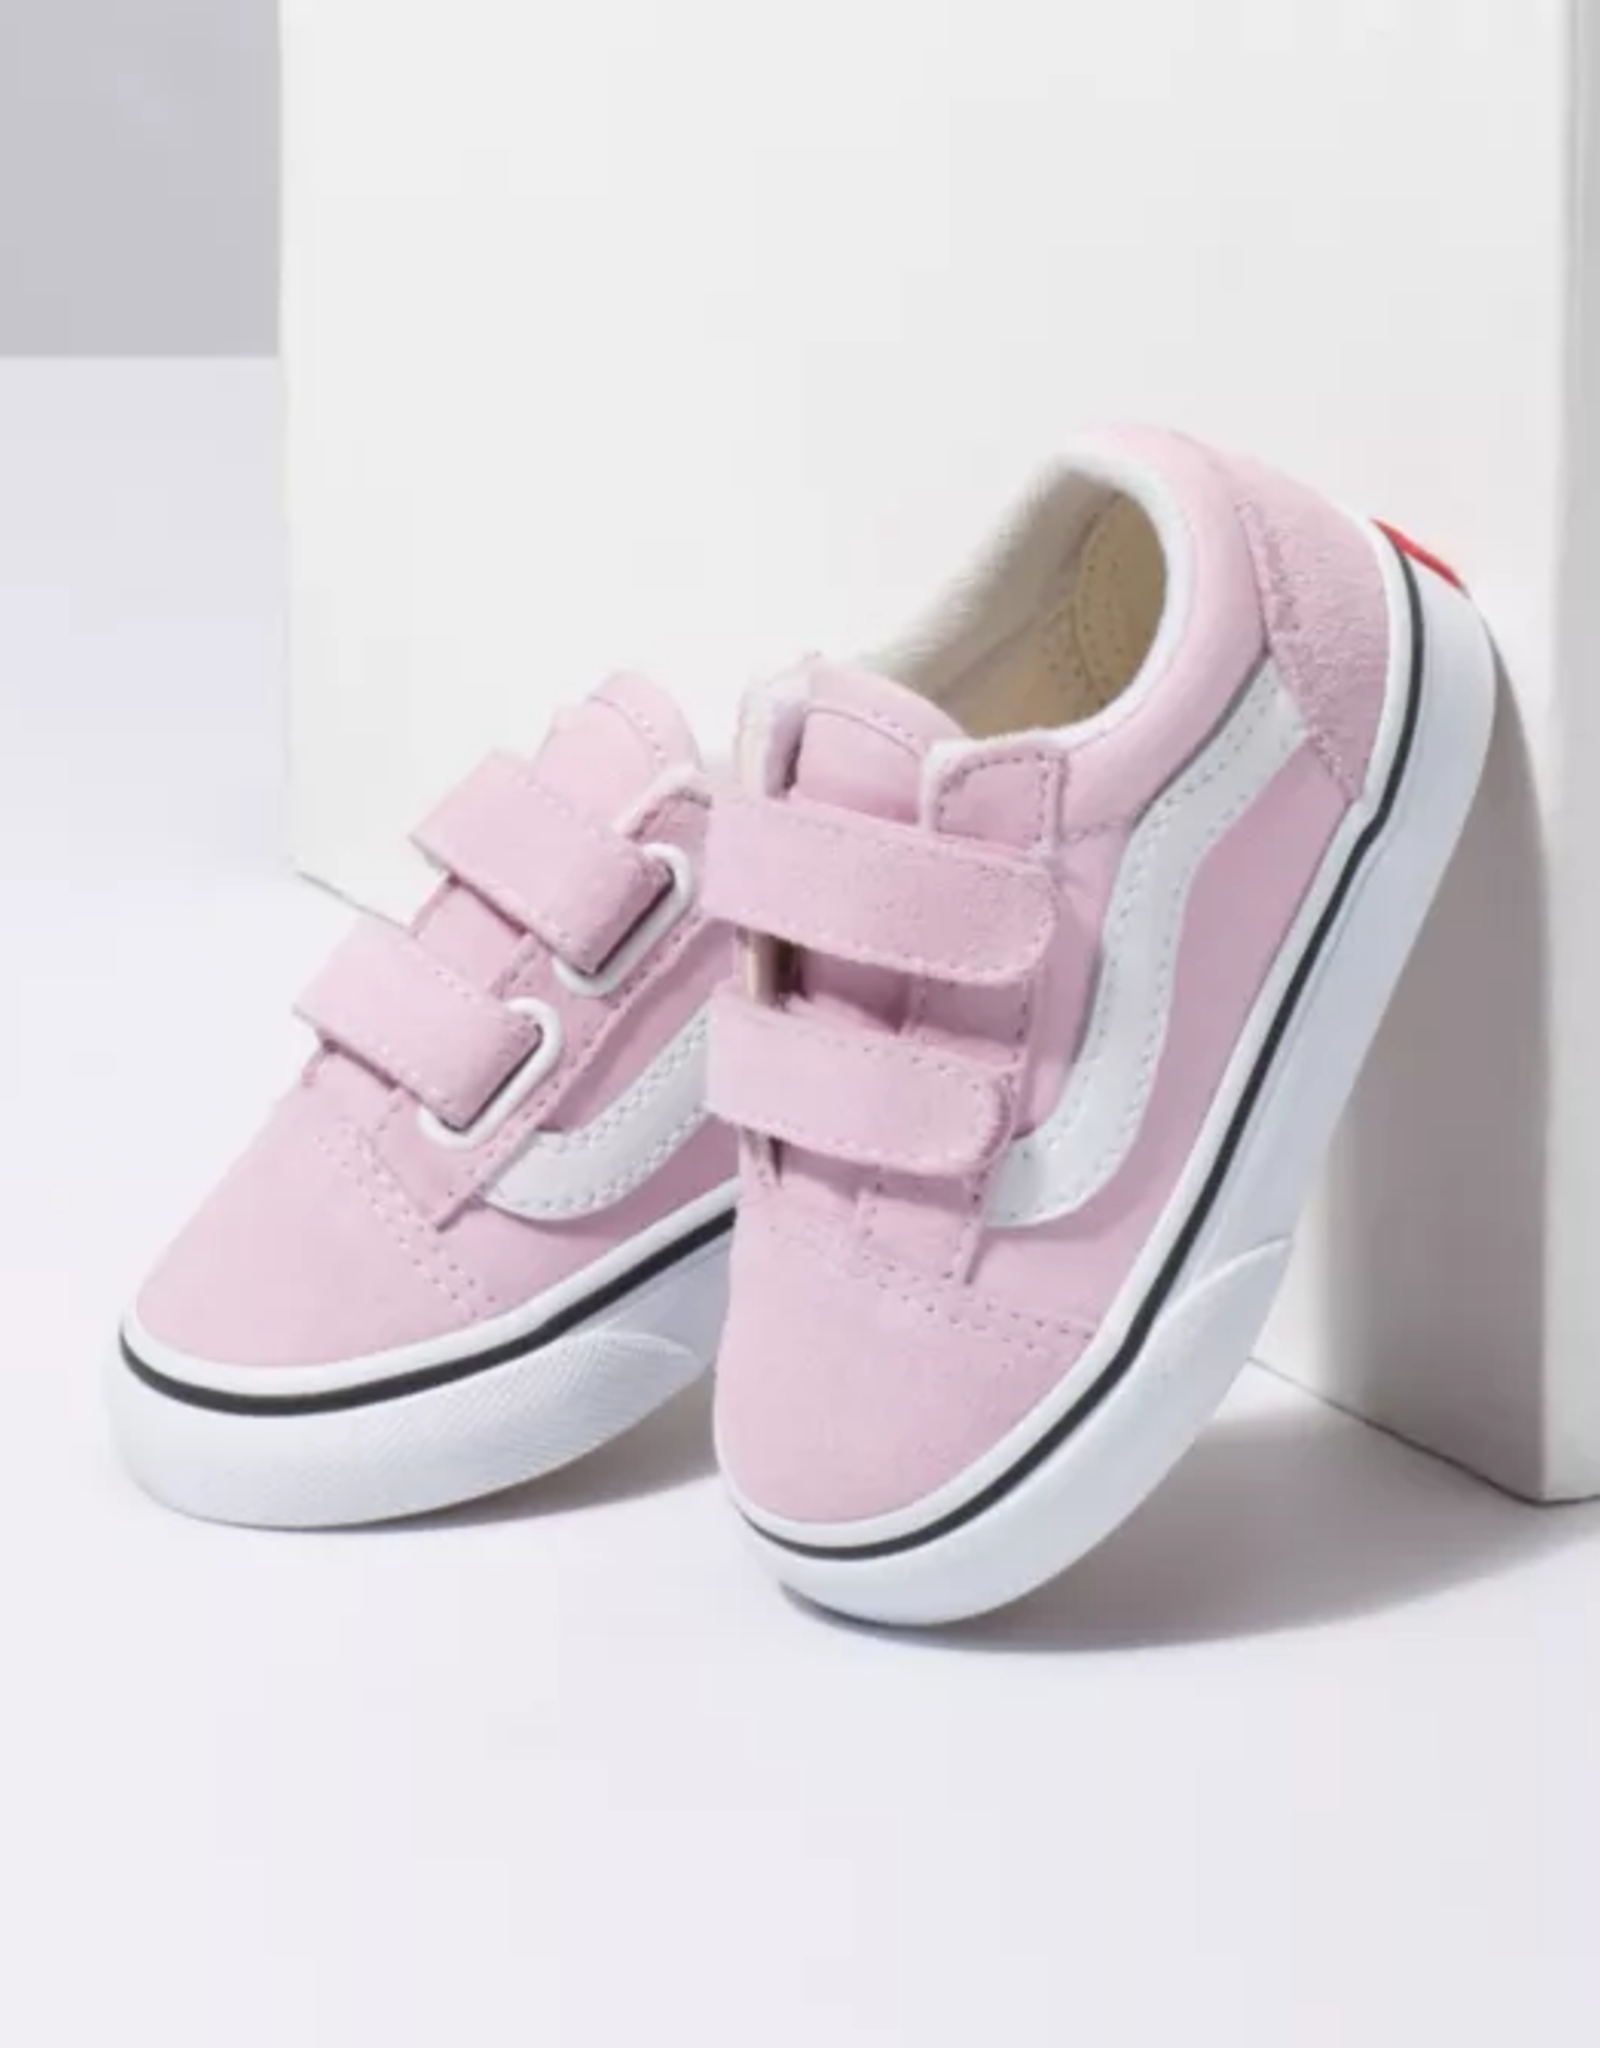 Vans Toddler Old Skool V - Lilac/true white